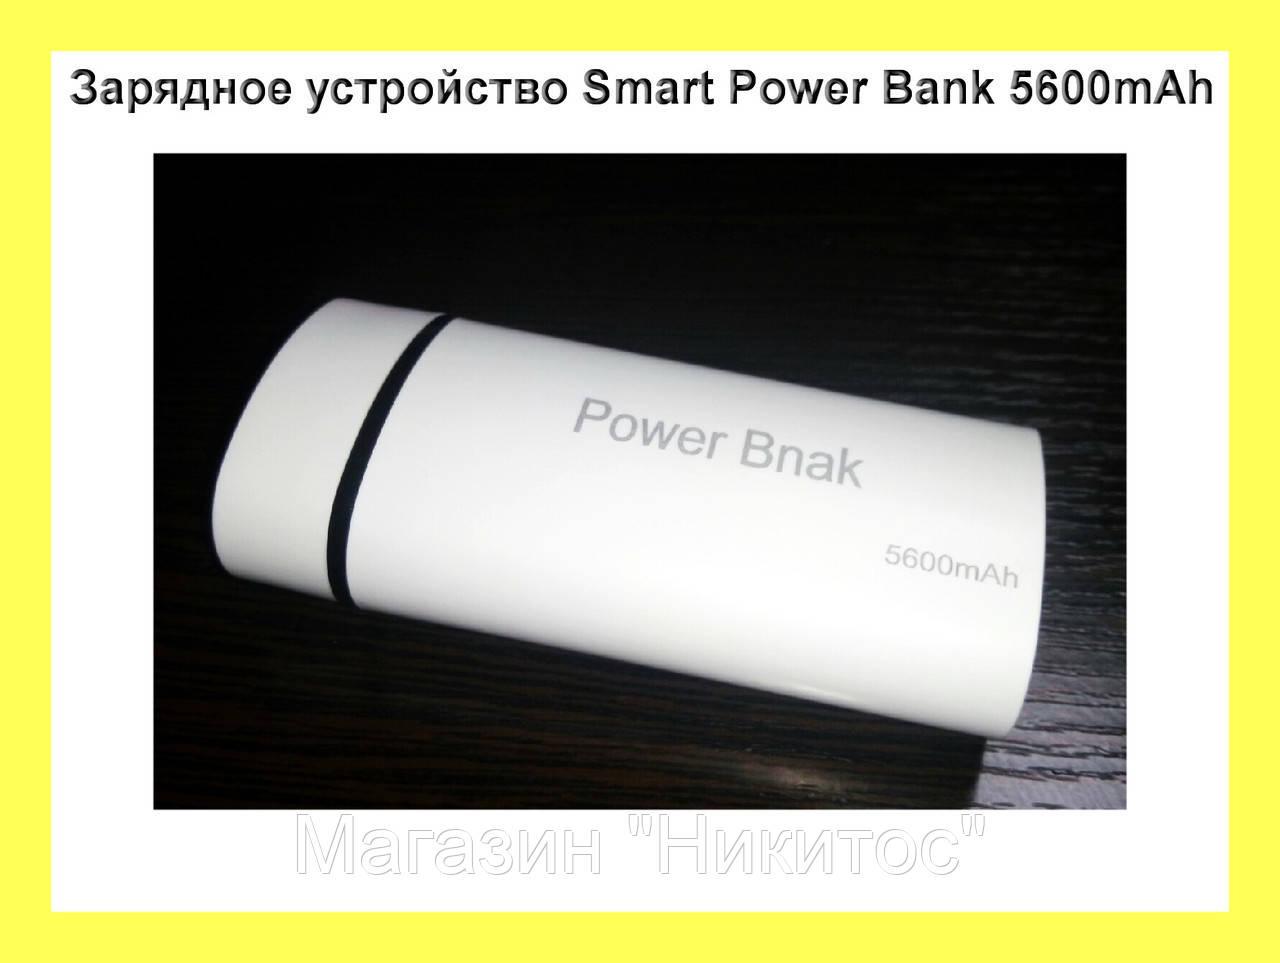 SALE!Зарядное устройство Smart Power Bank 5600mAh